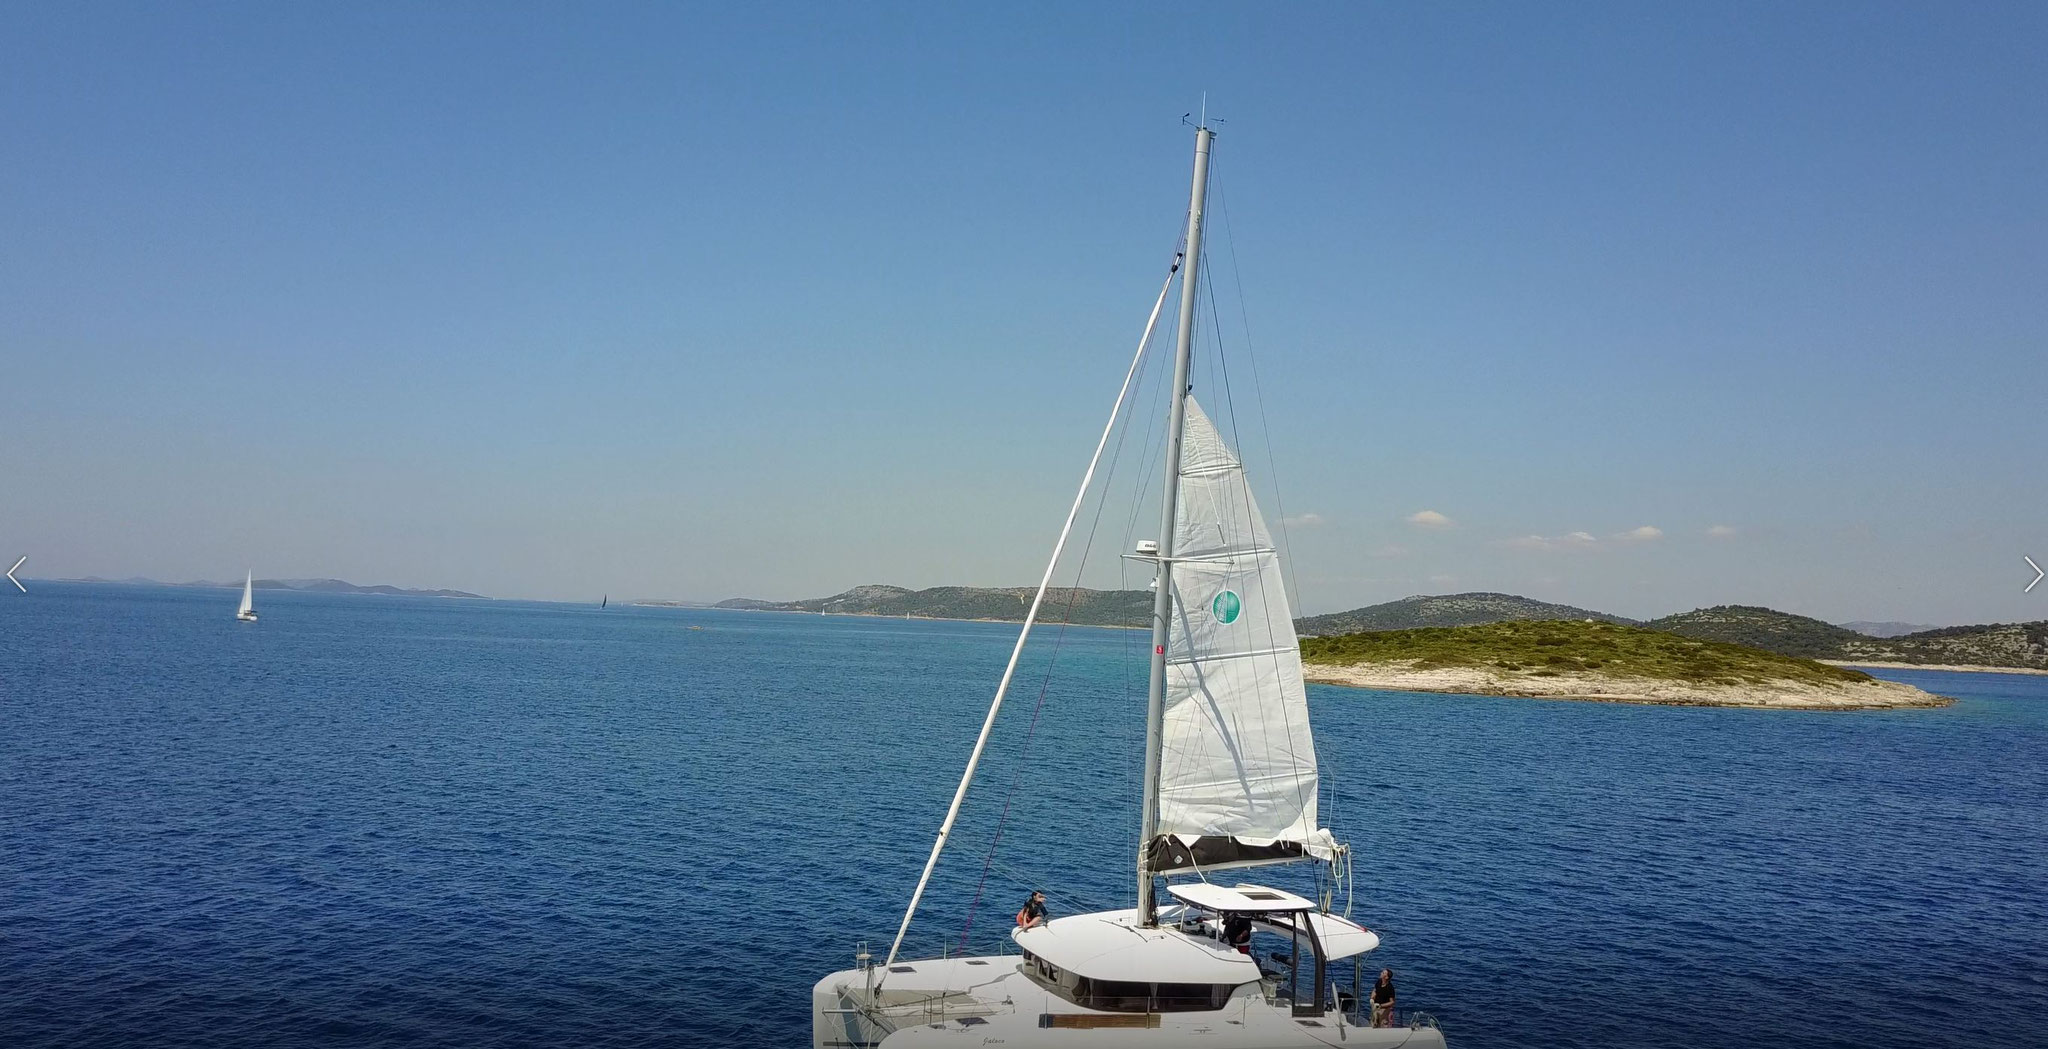 Katamaran segeln als Urlaubsreise - www.katamaramtraum.com